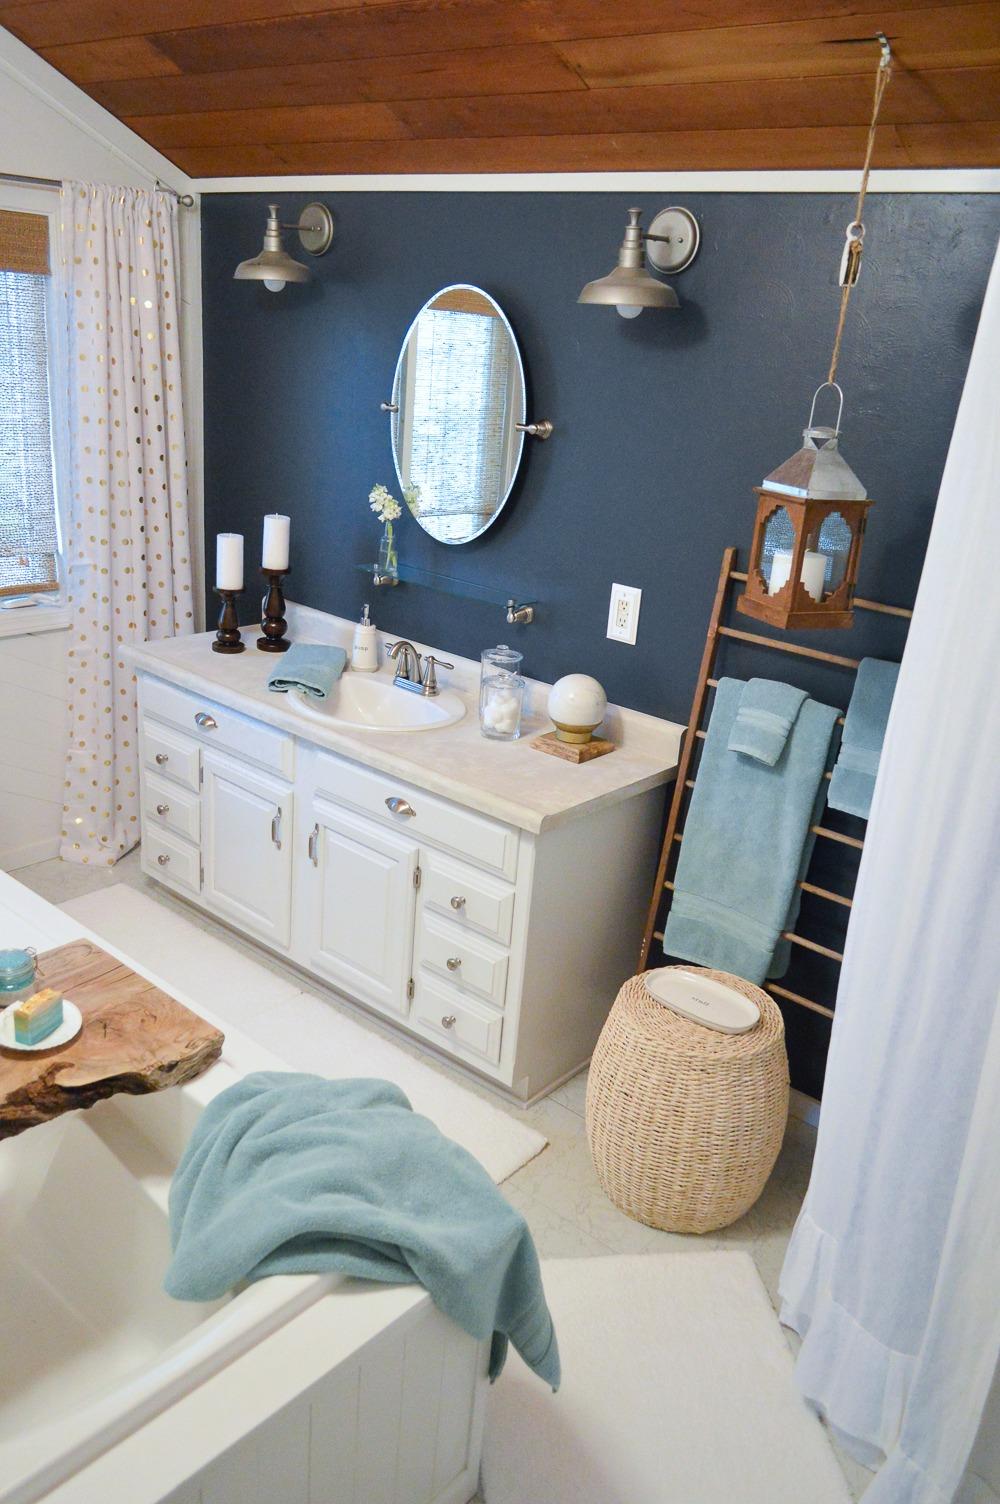 Aqua Summer Bathroom Refresh | Eclectic bath mini makeover; Hale Navy walls, white vanity, galvanized farmhouse lighting.